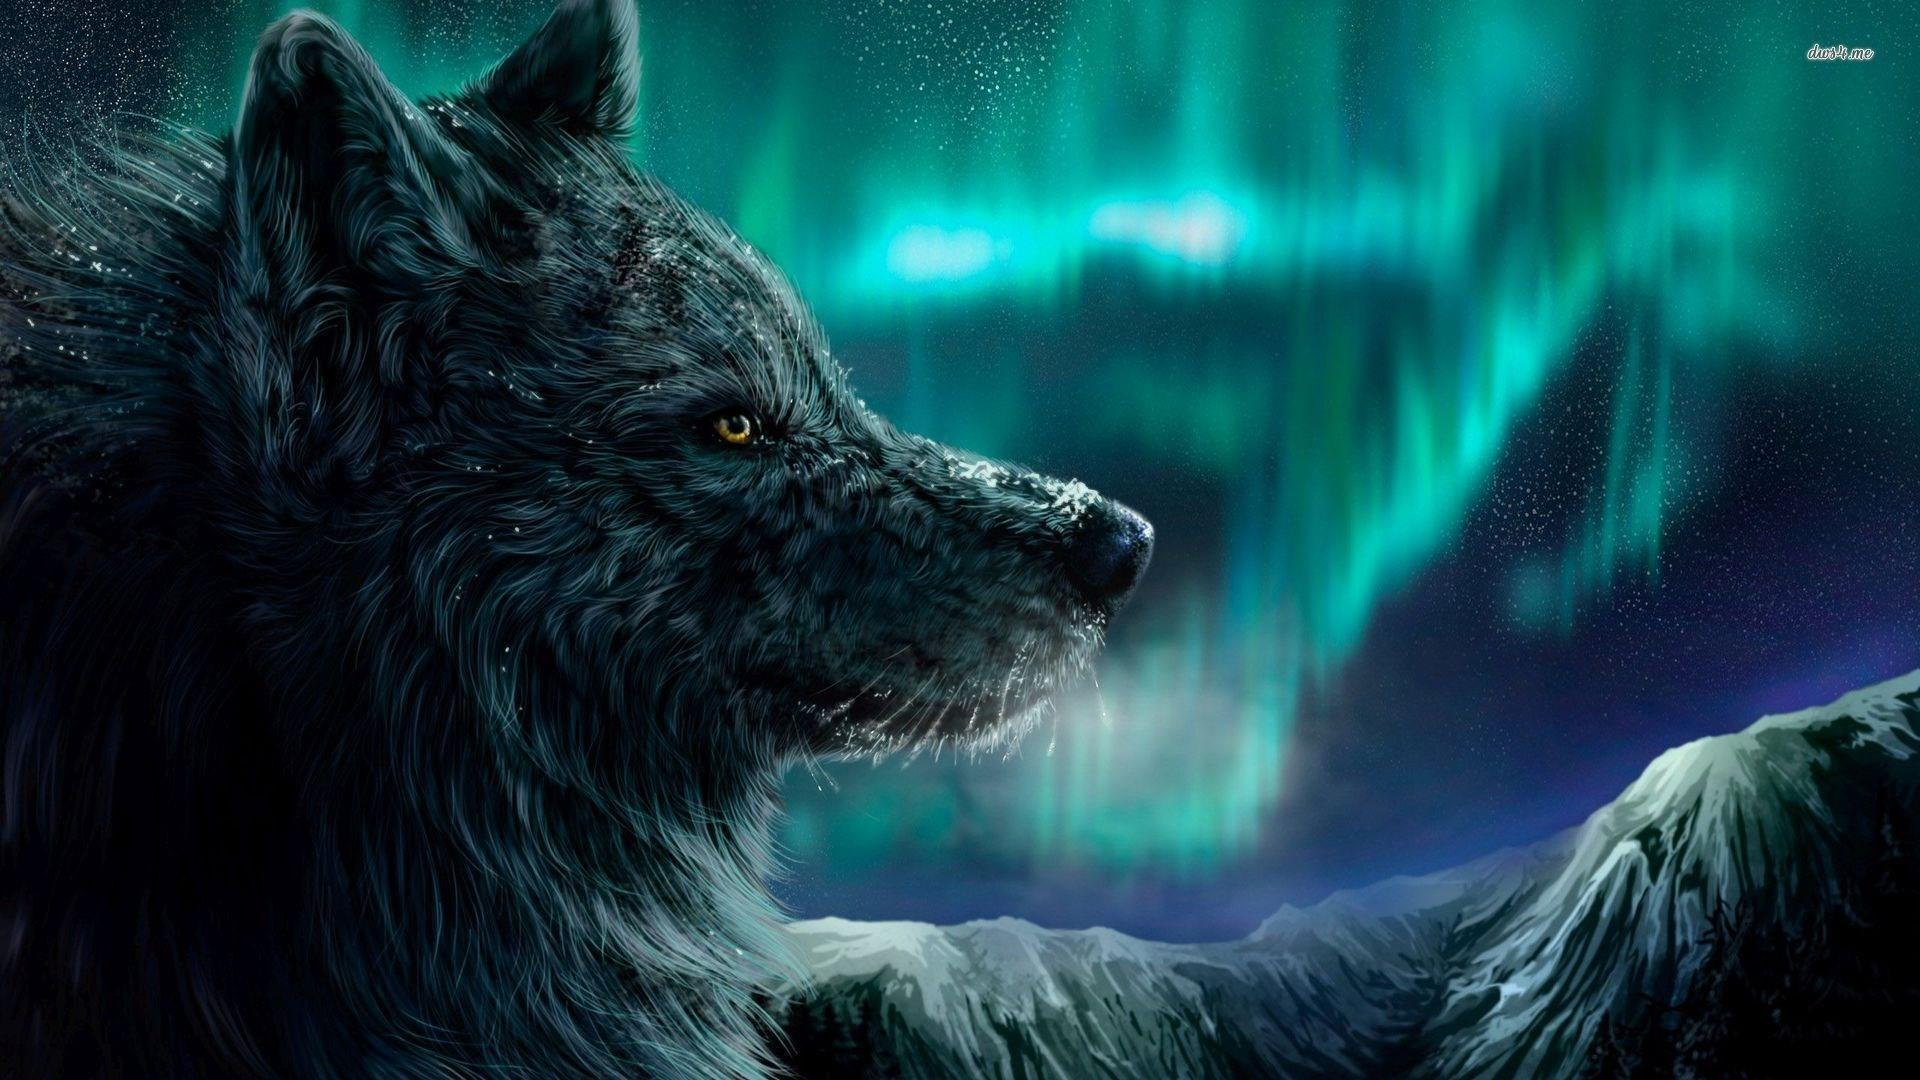 wolf art wallpaper 1080p high quality, 1920 x 1080 (273 kB)